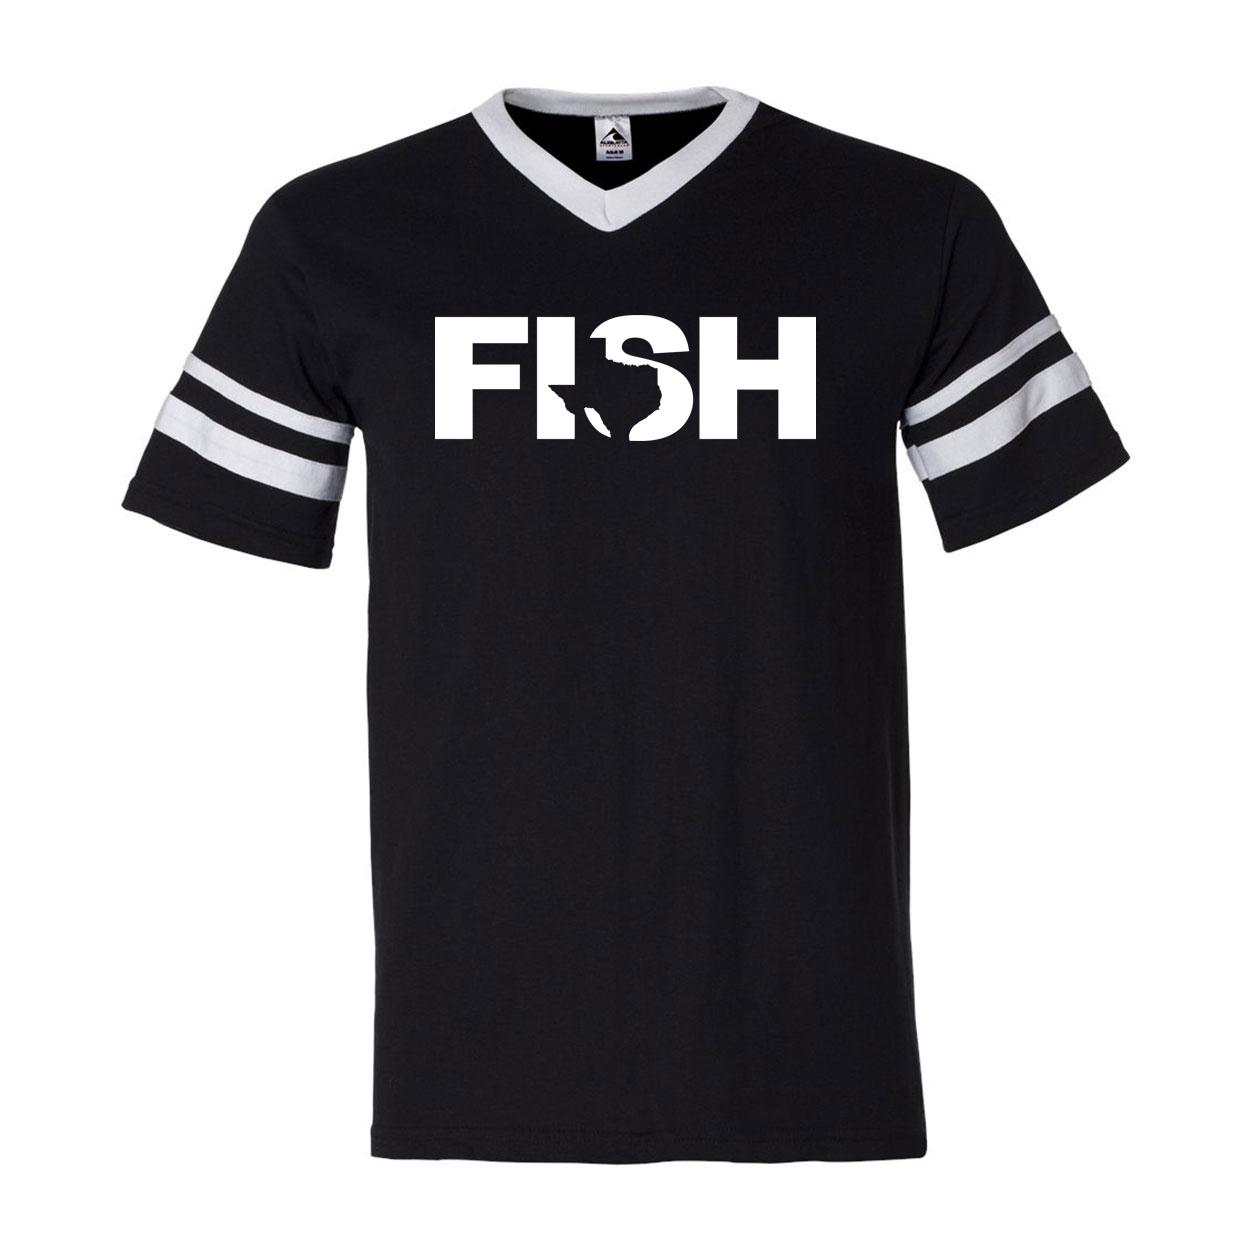 Fish Texas Classic Premium Striped Jersey T-Shirt Black/White (White Logo)